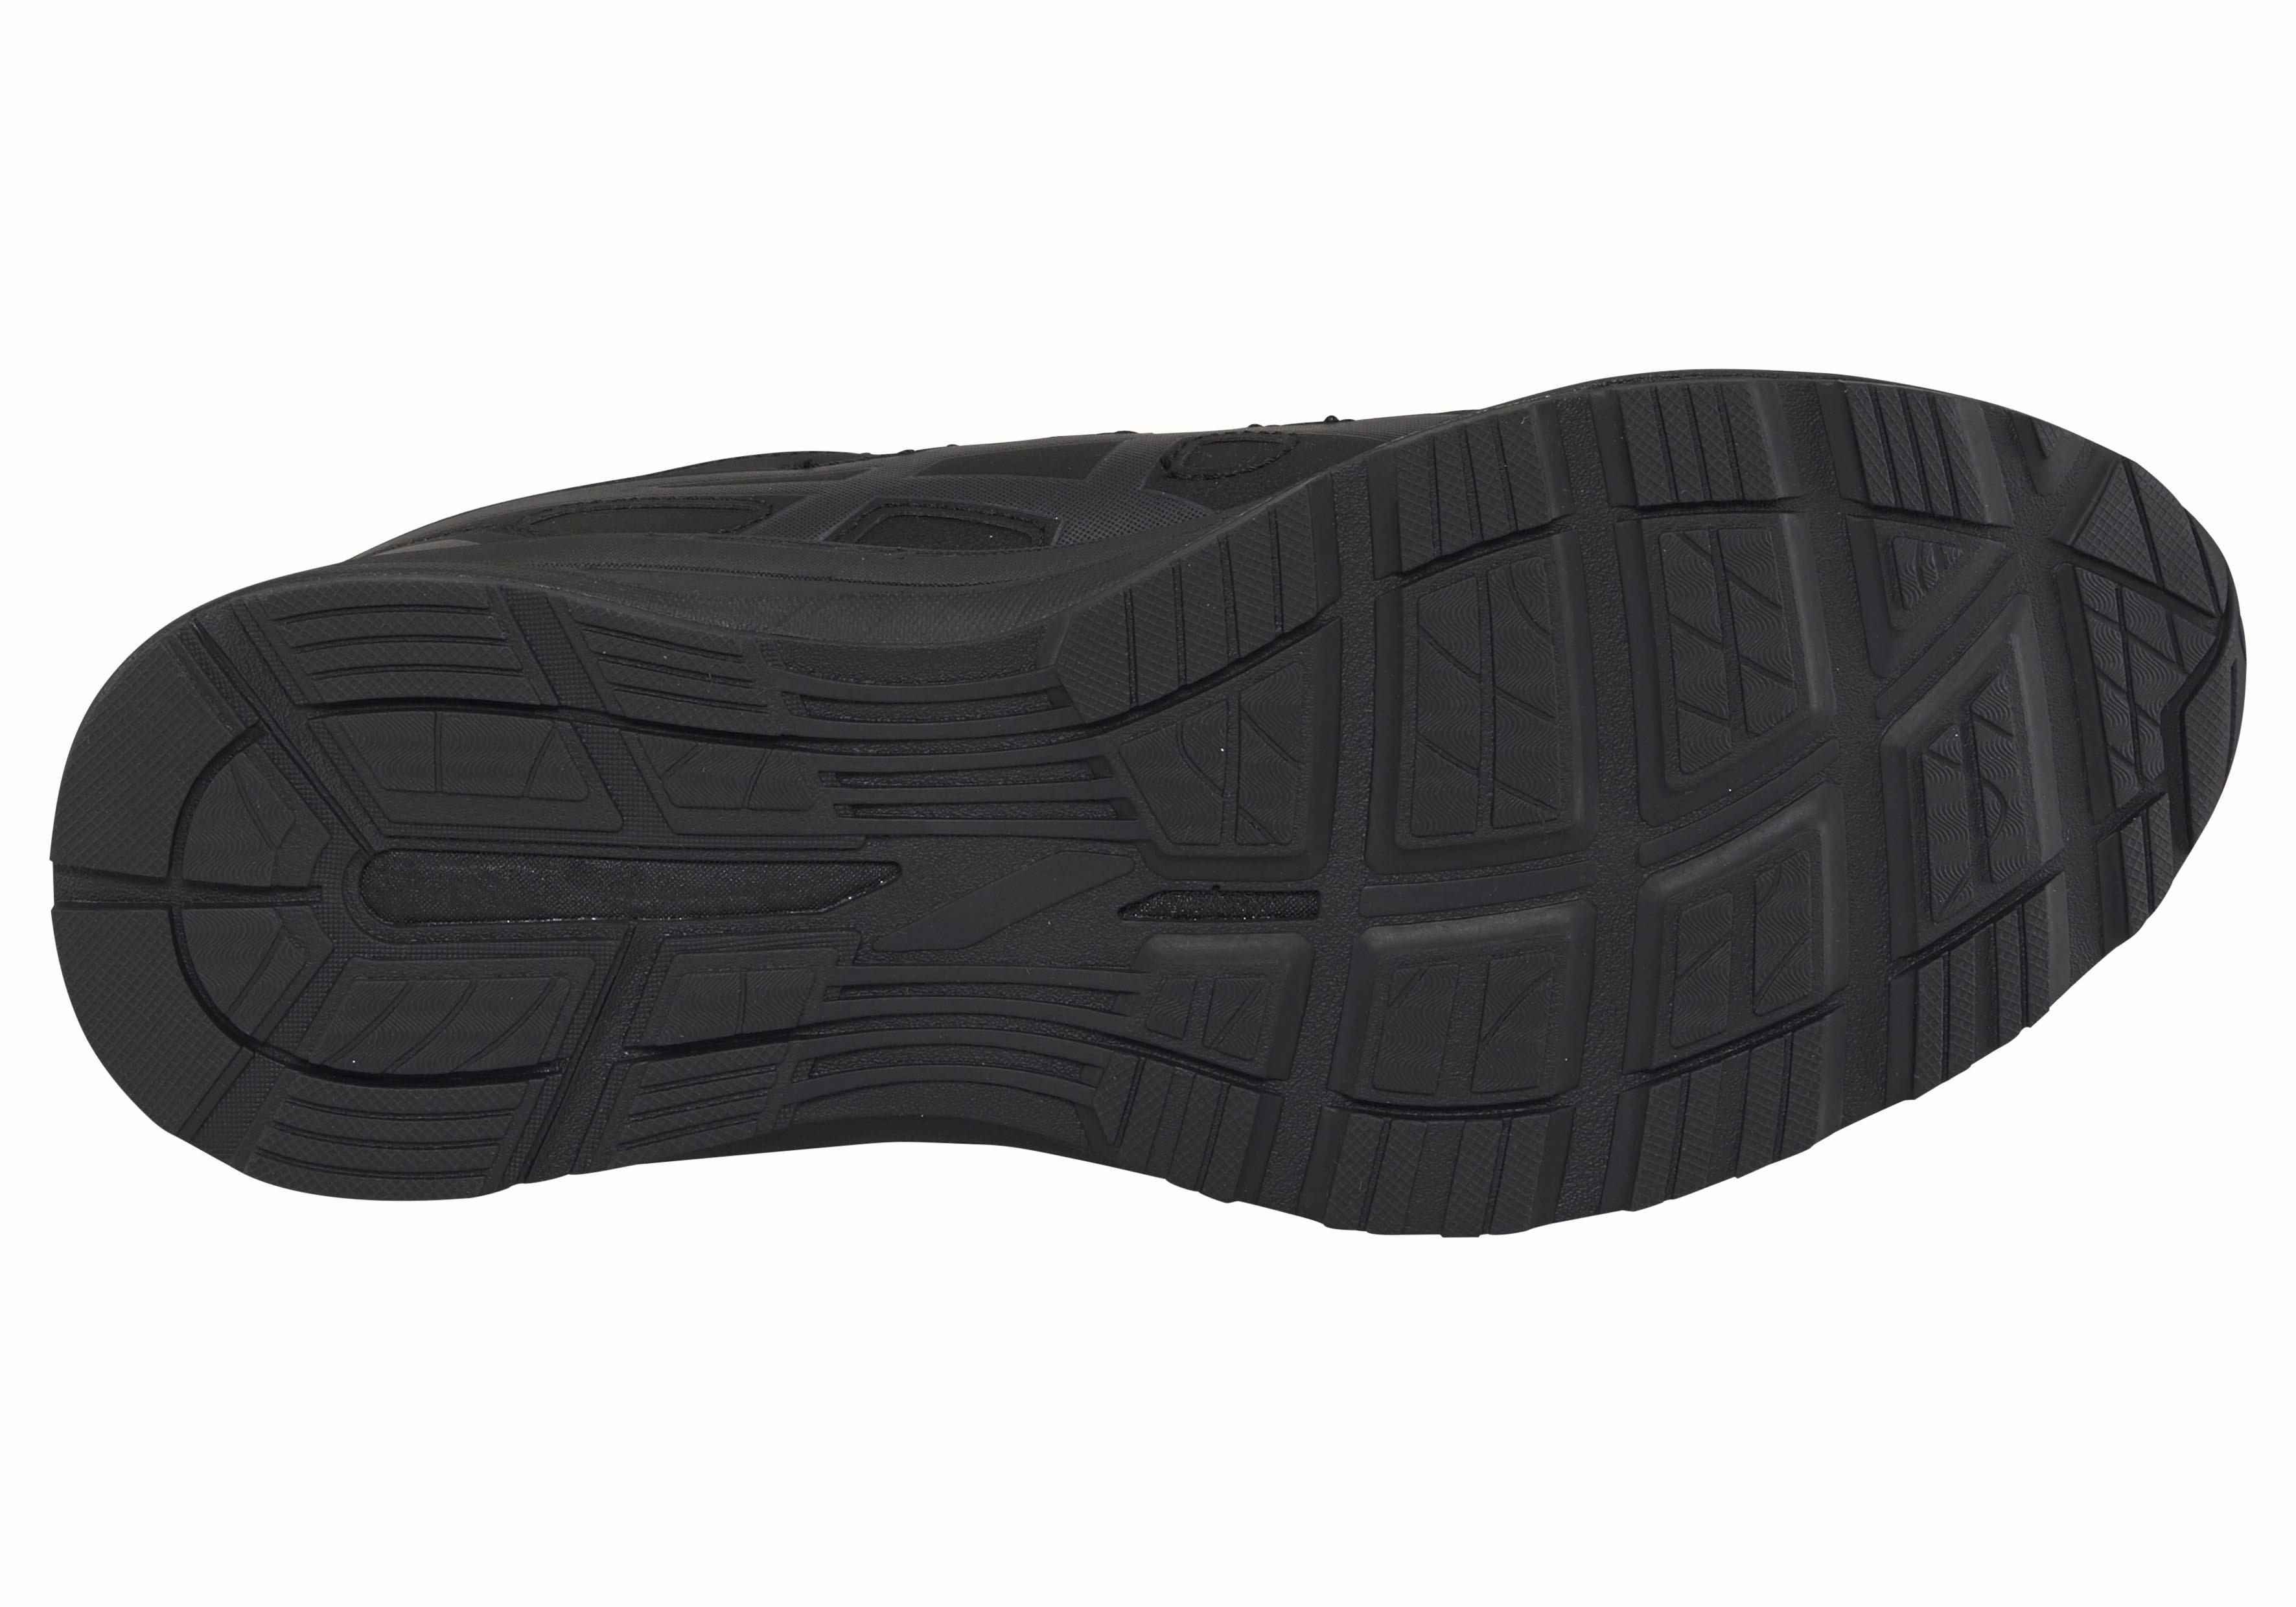 24adfcbfdfbd6 Asics wandelschoenen »Gel-Mission 3« snel gevonden